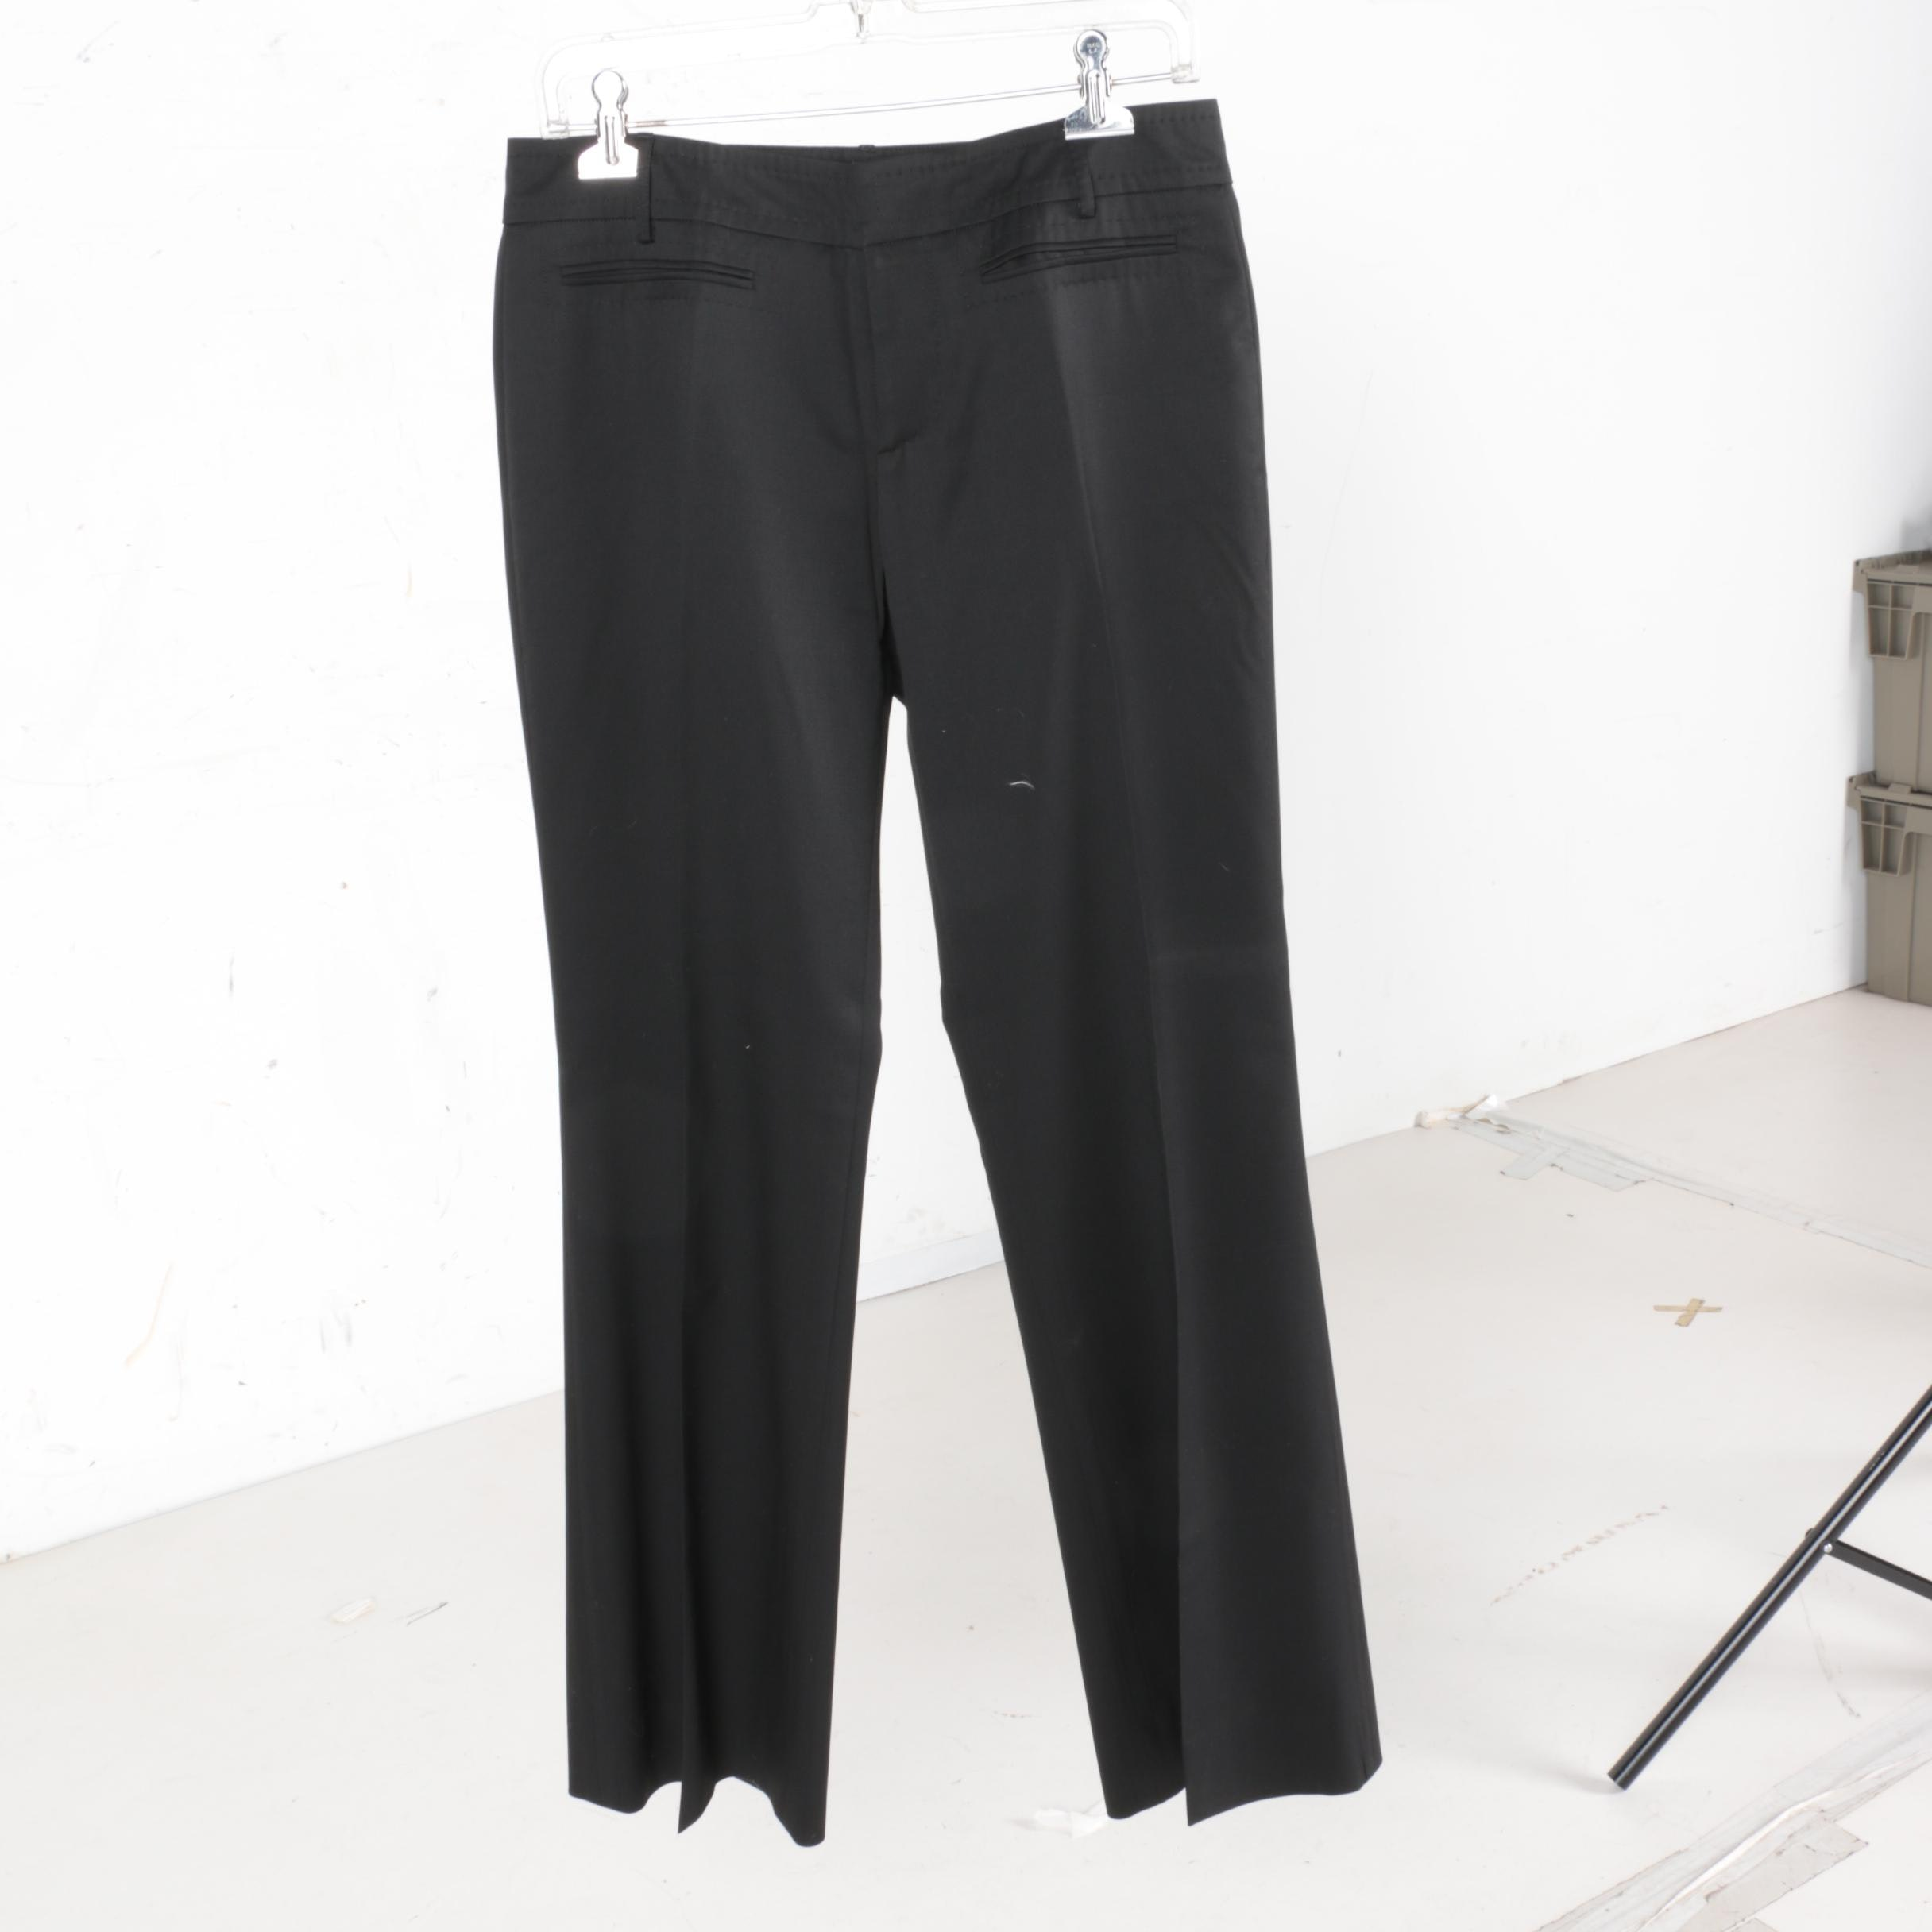 Gucci Black Wool Pants